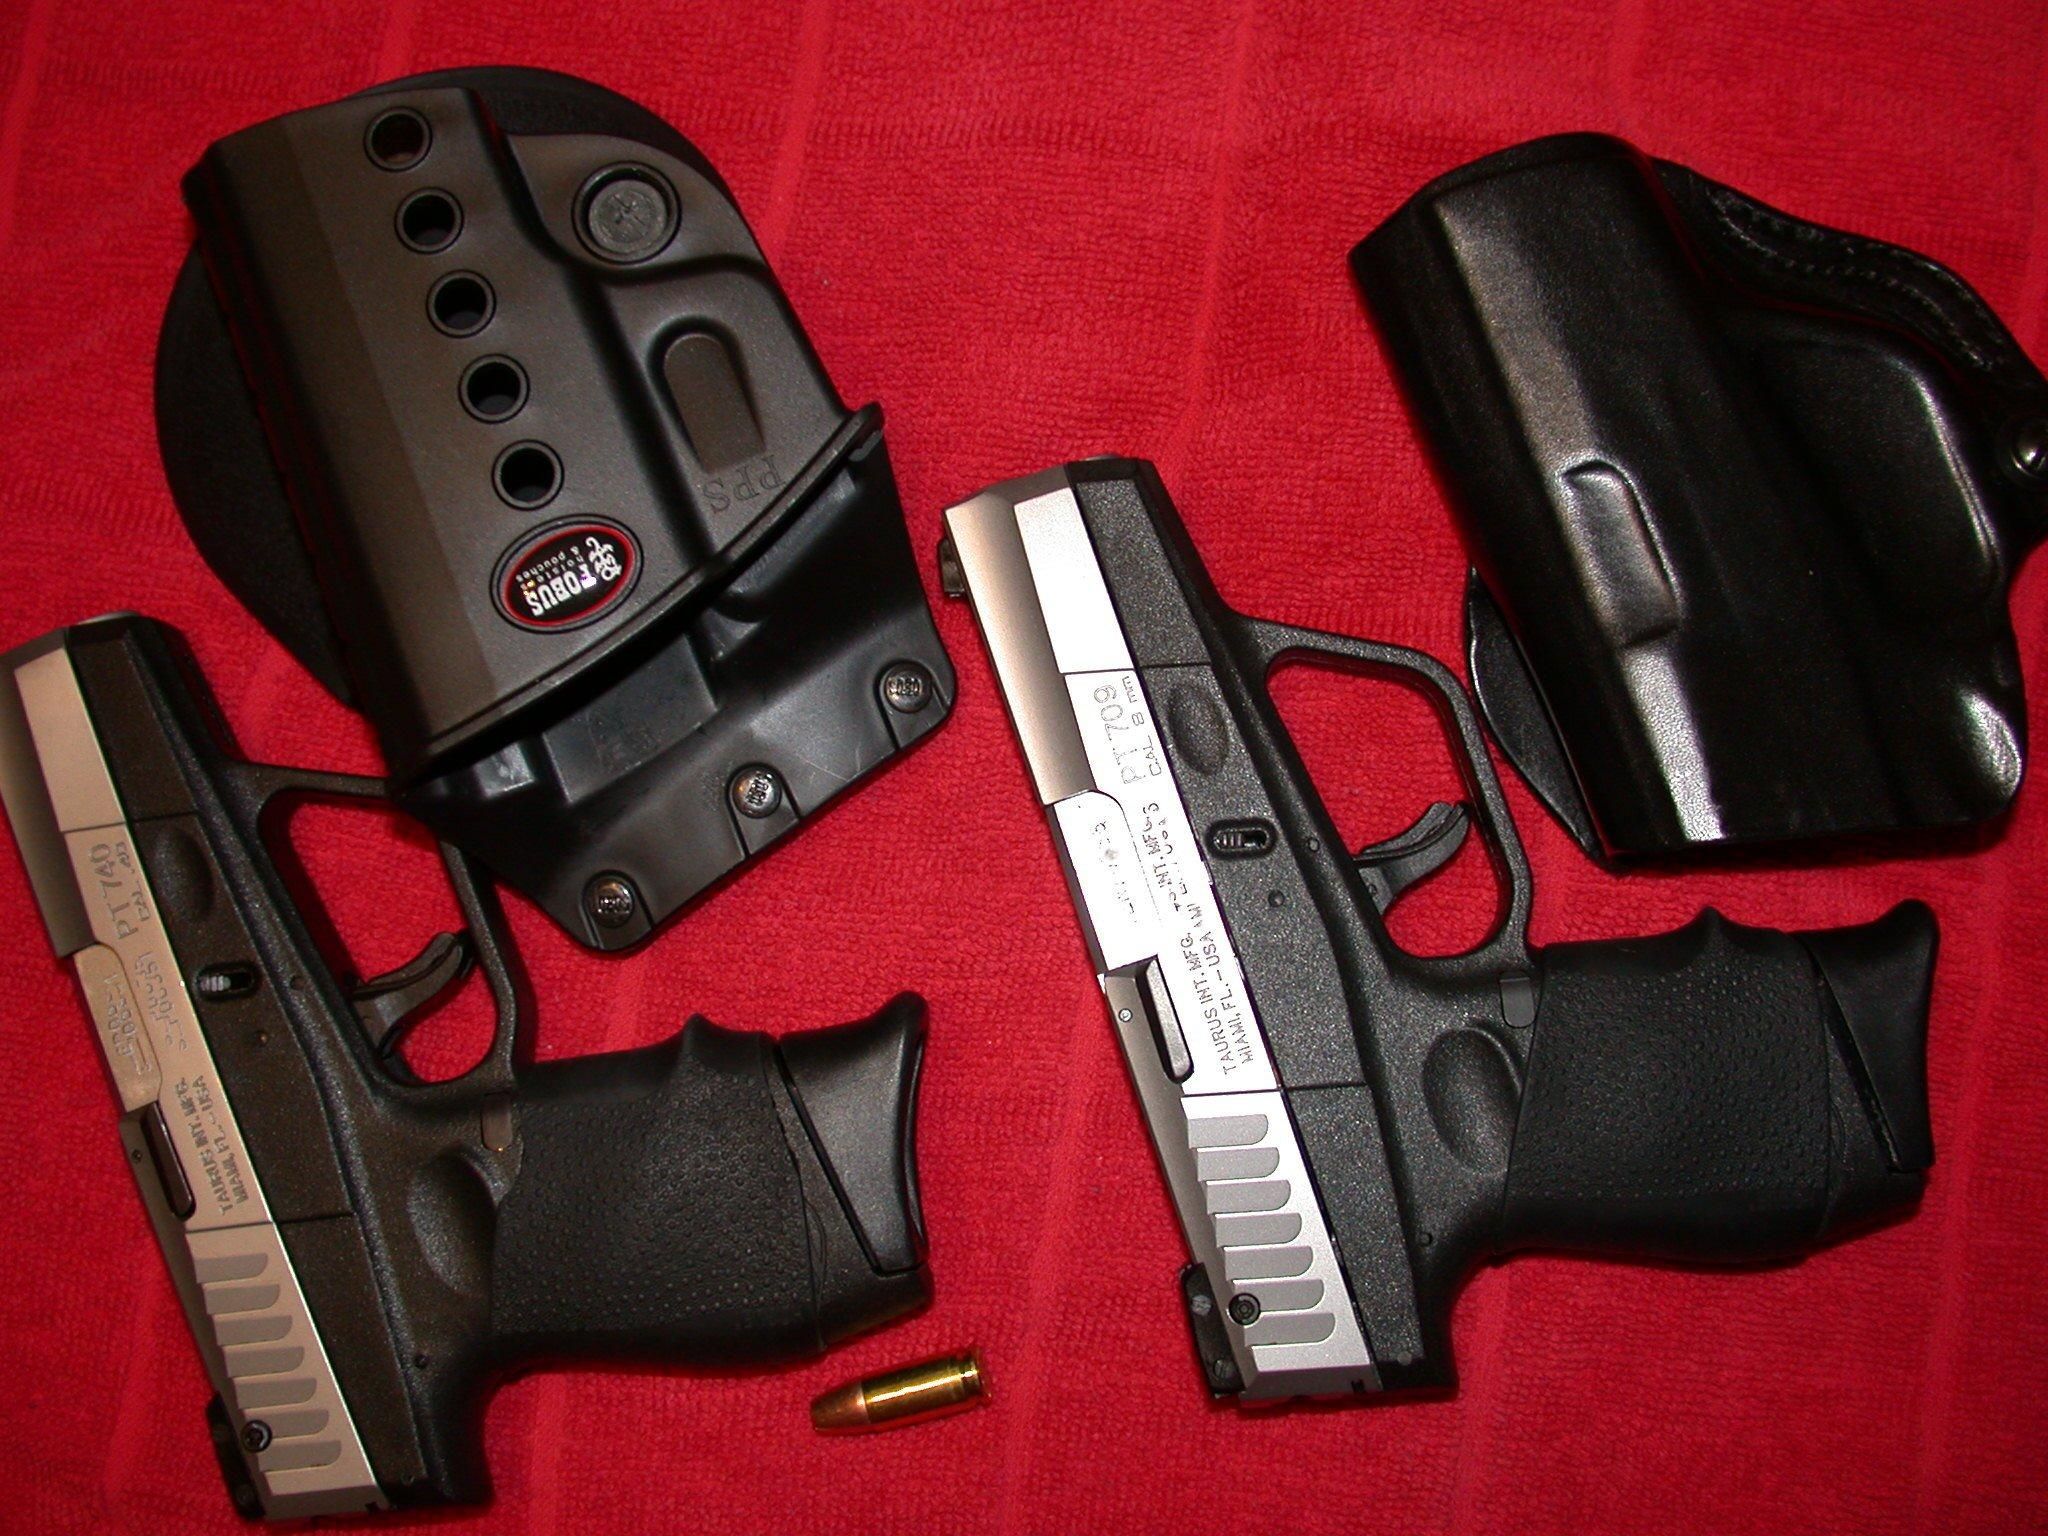 709 slim 9mm pistol - Attached Images